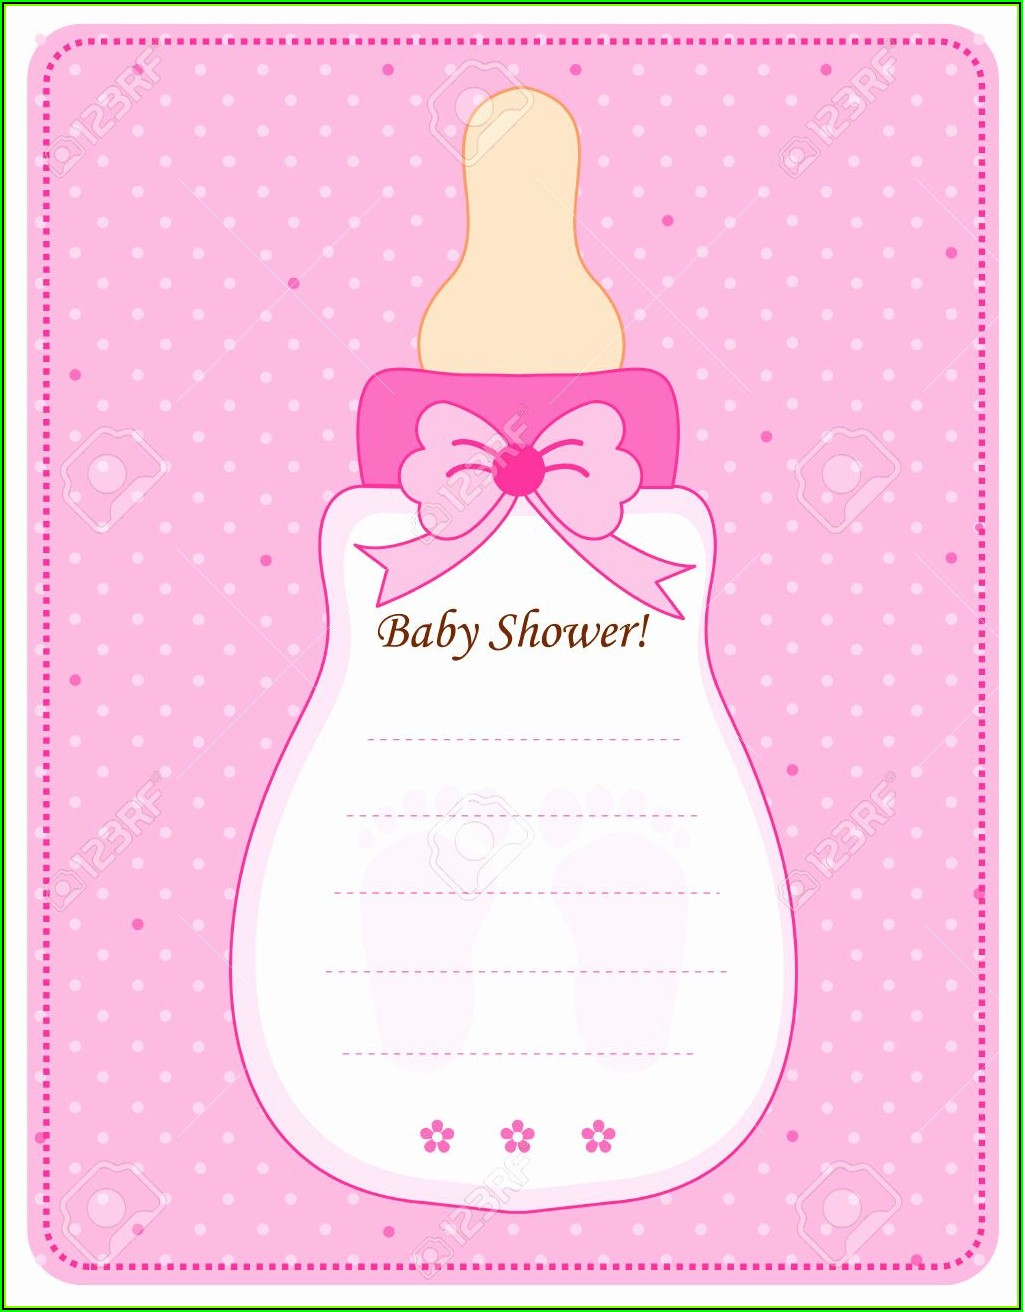 Girl Baby Shower Invitations Templates Editable